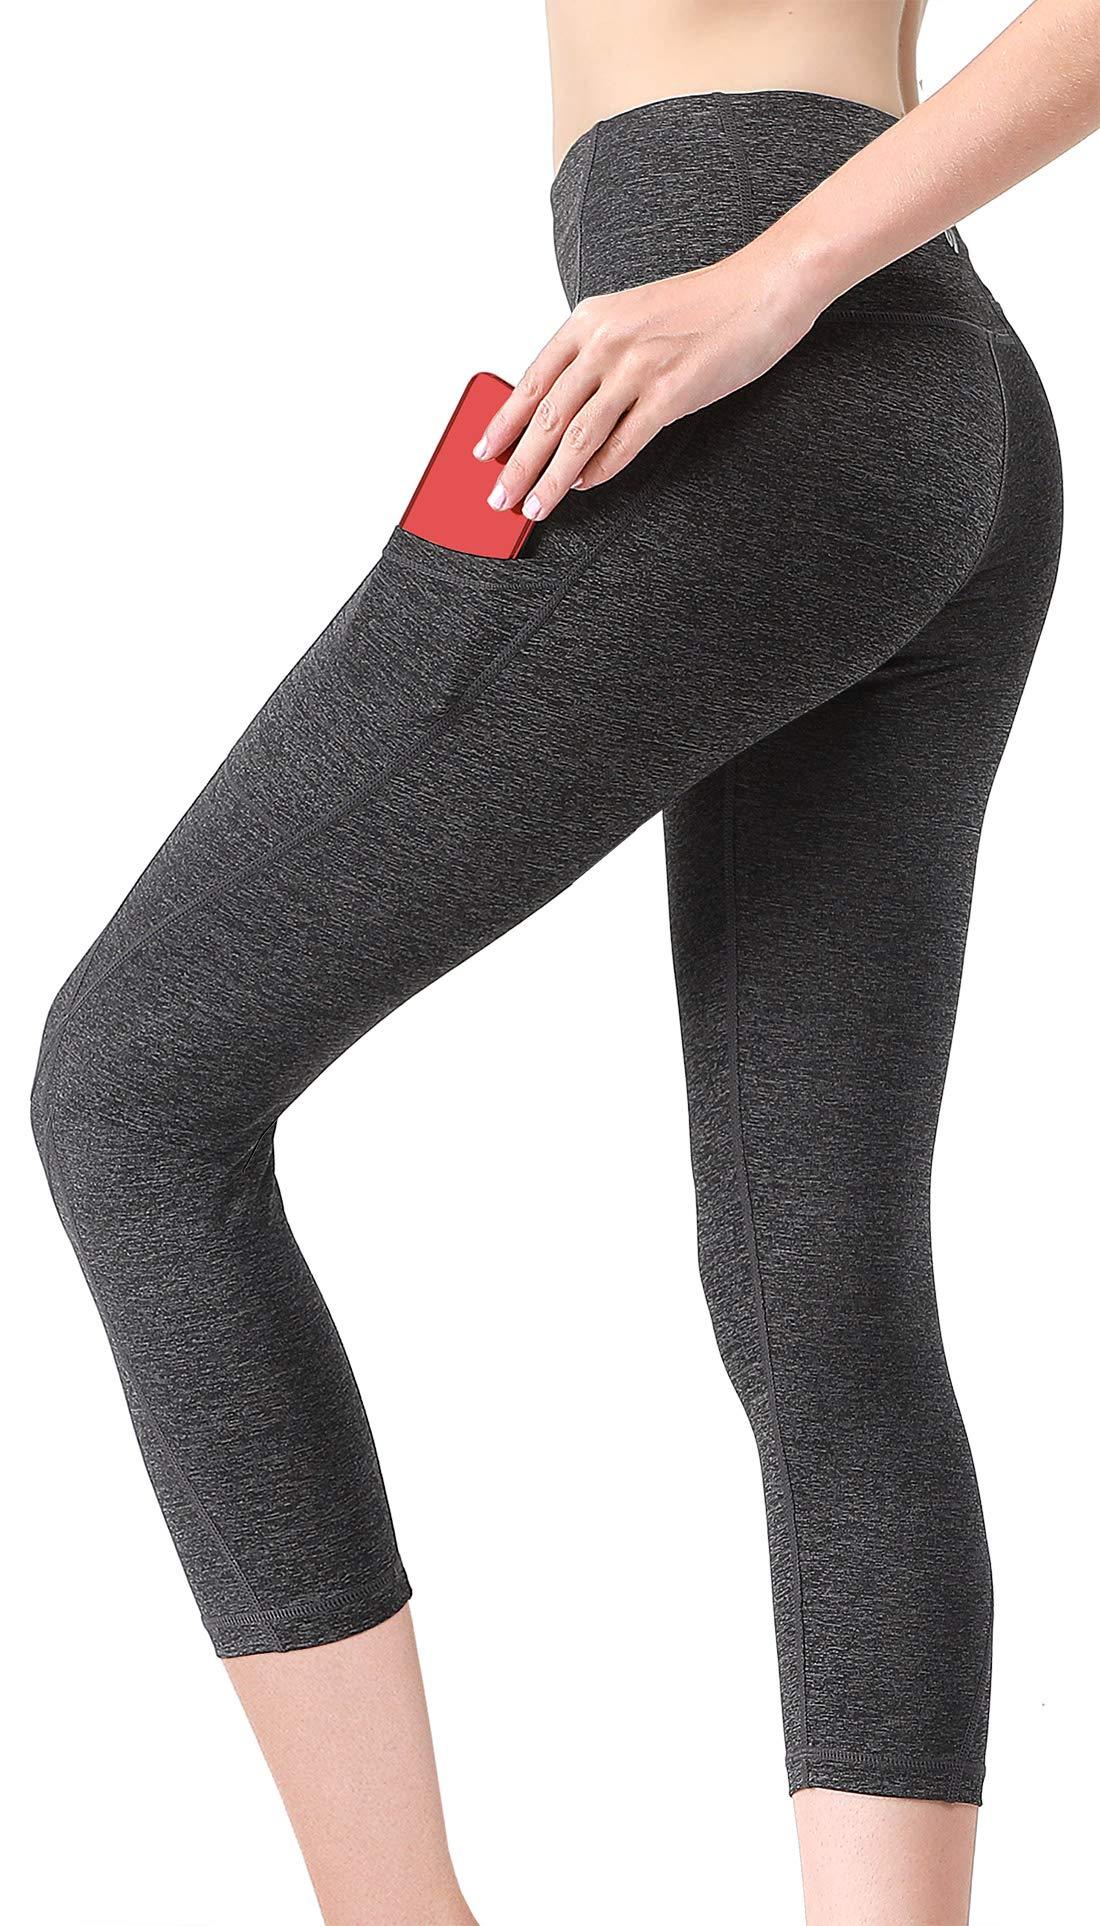 39ac1d3dfaf850 MYoga Women's Yoga Pants Workout Capri Leggings Running Tights Active Pants  w Side Pockets (S, SP_C)